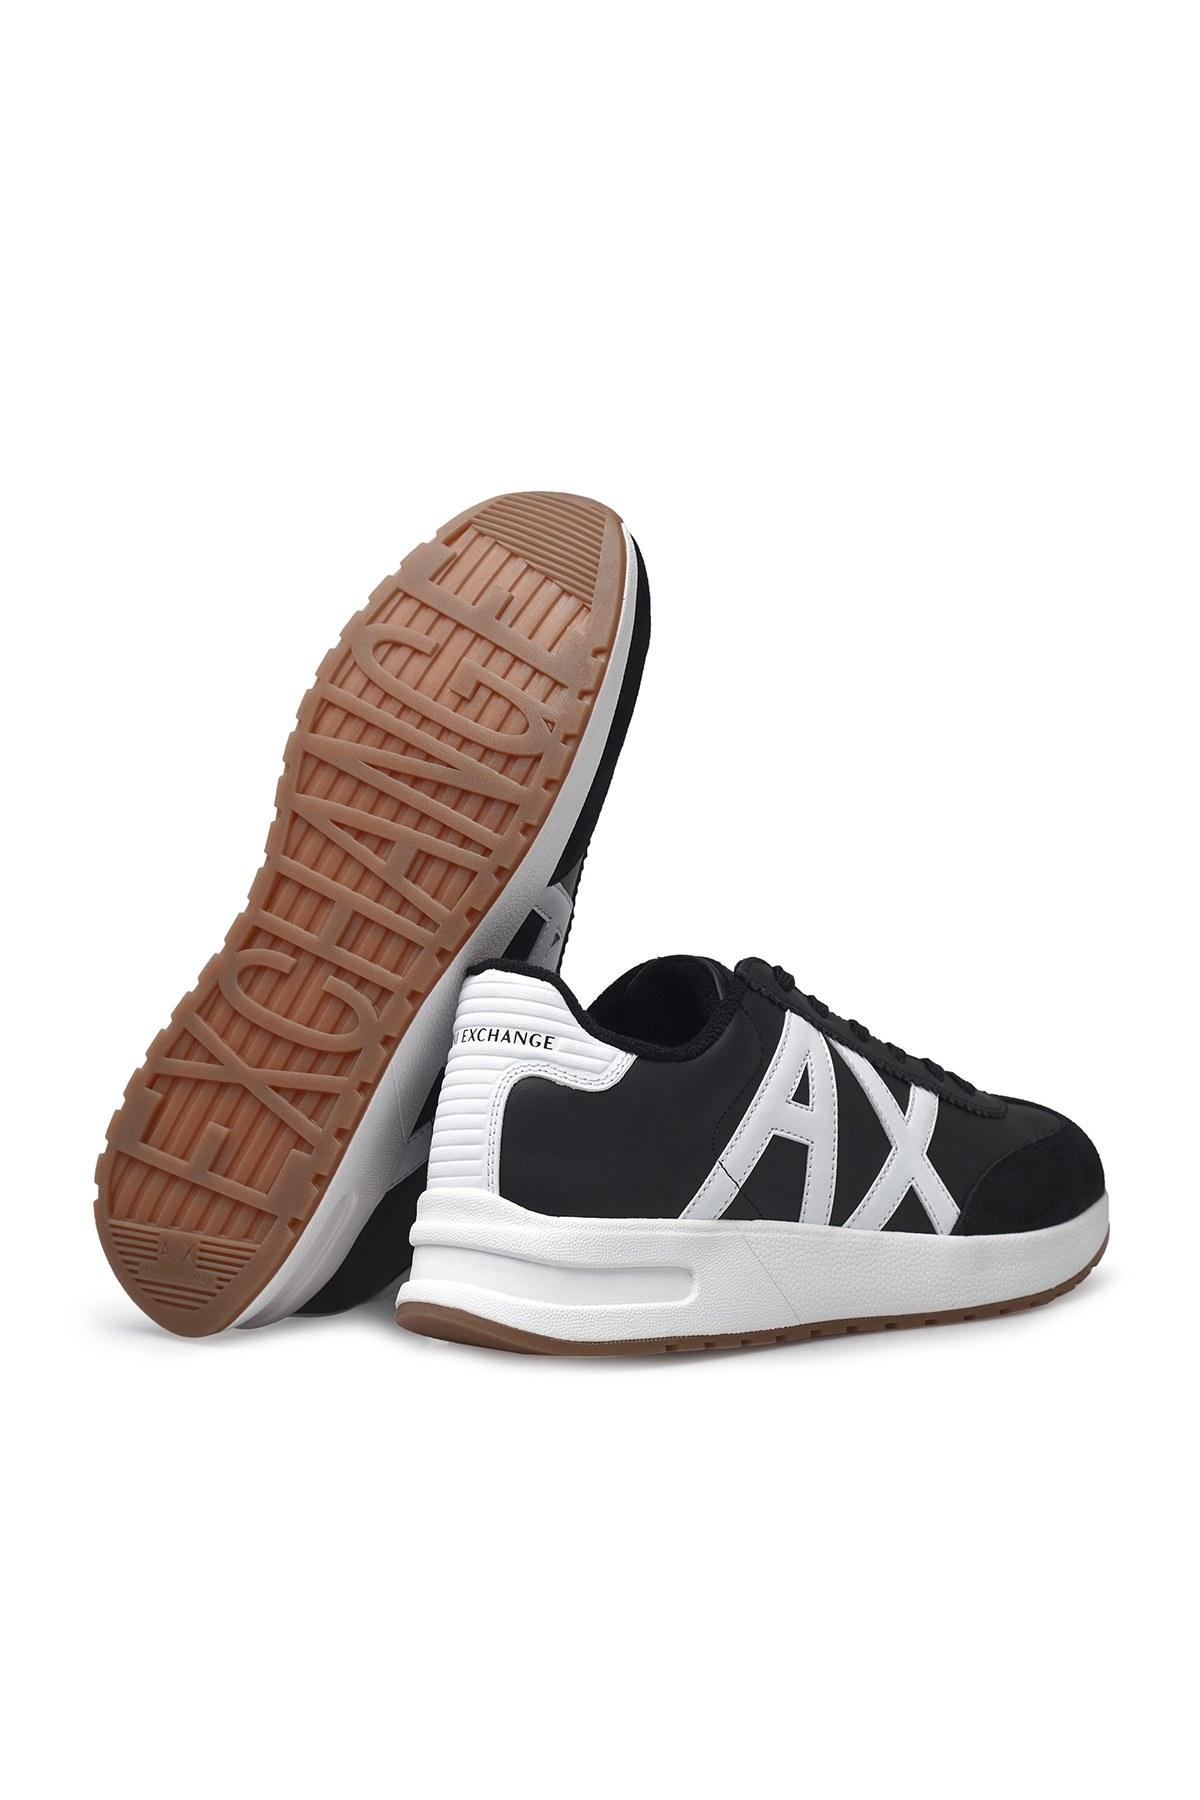 Armani Exchange Erkek Ayakkabı XUX071 XV234 A120 SİYAH-BEYAZ